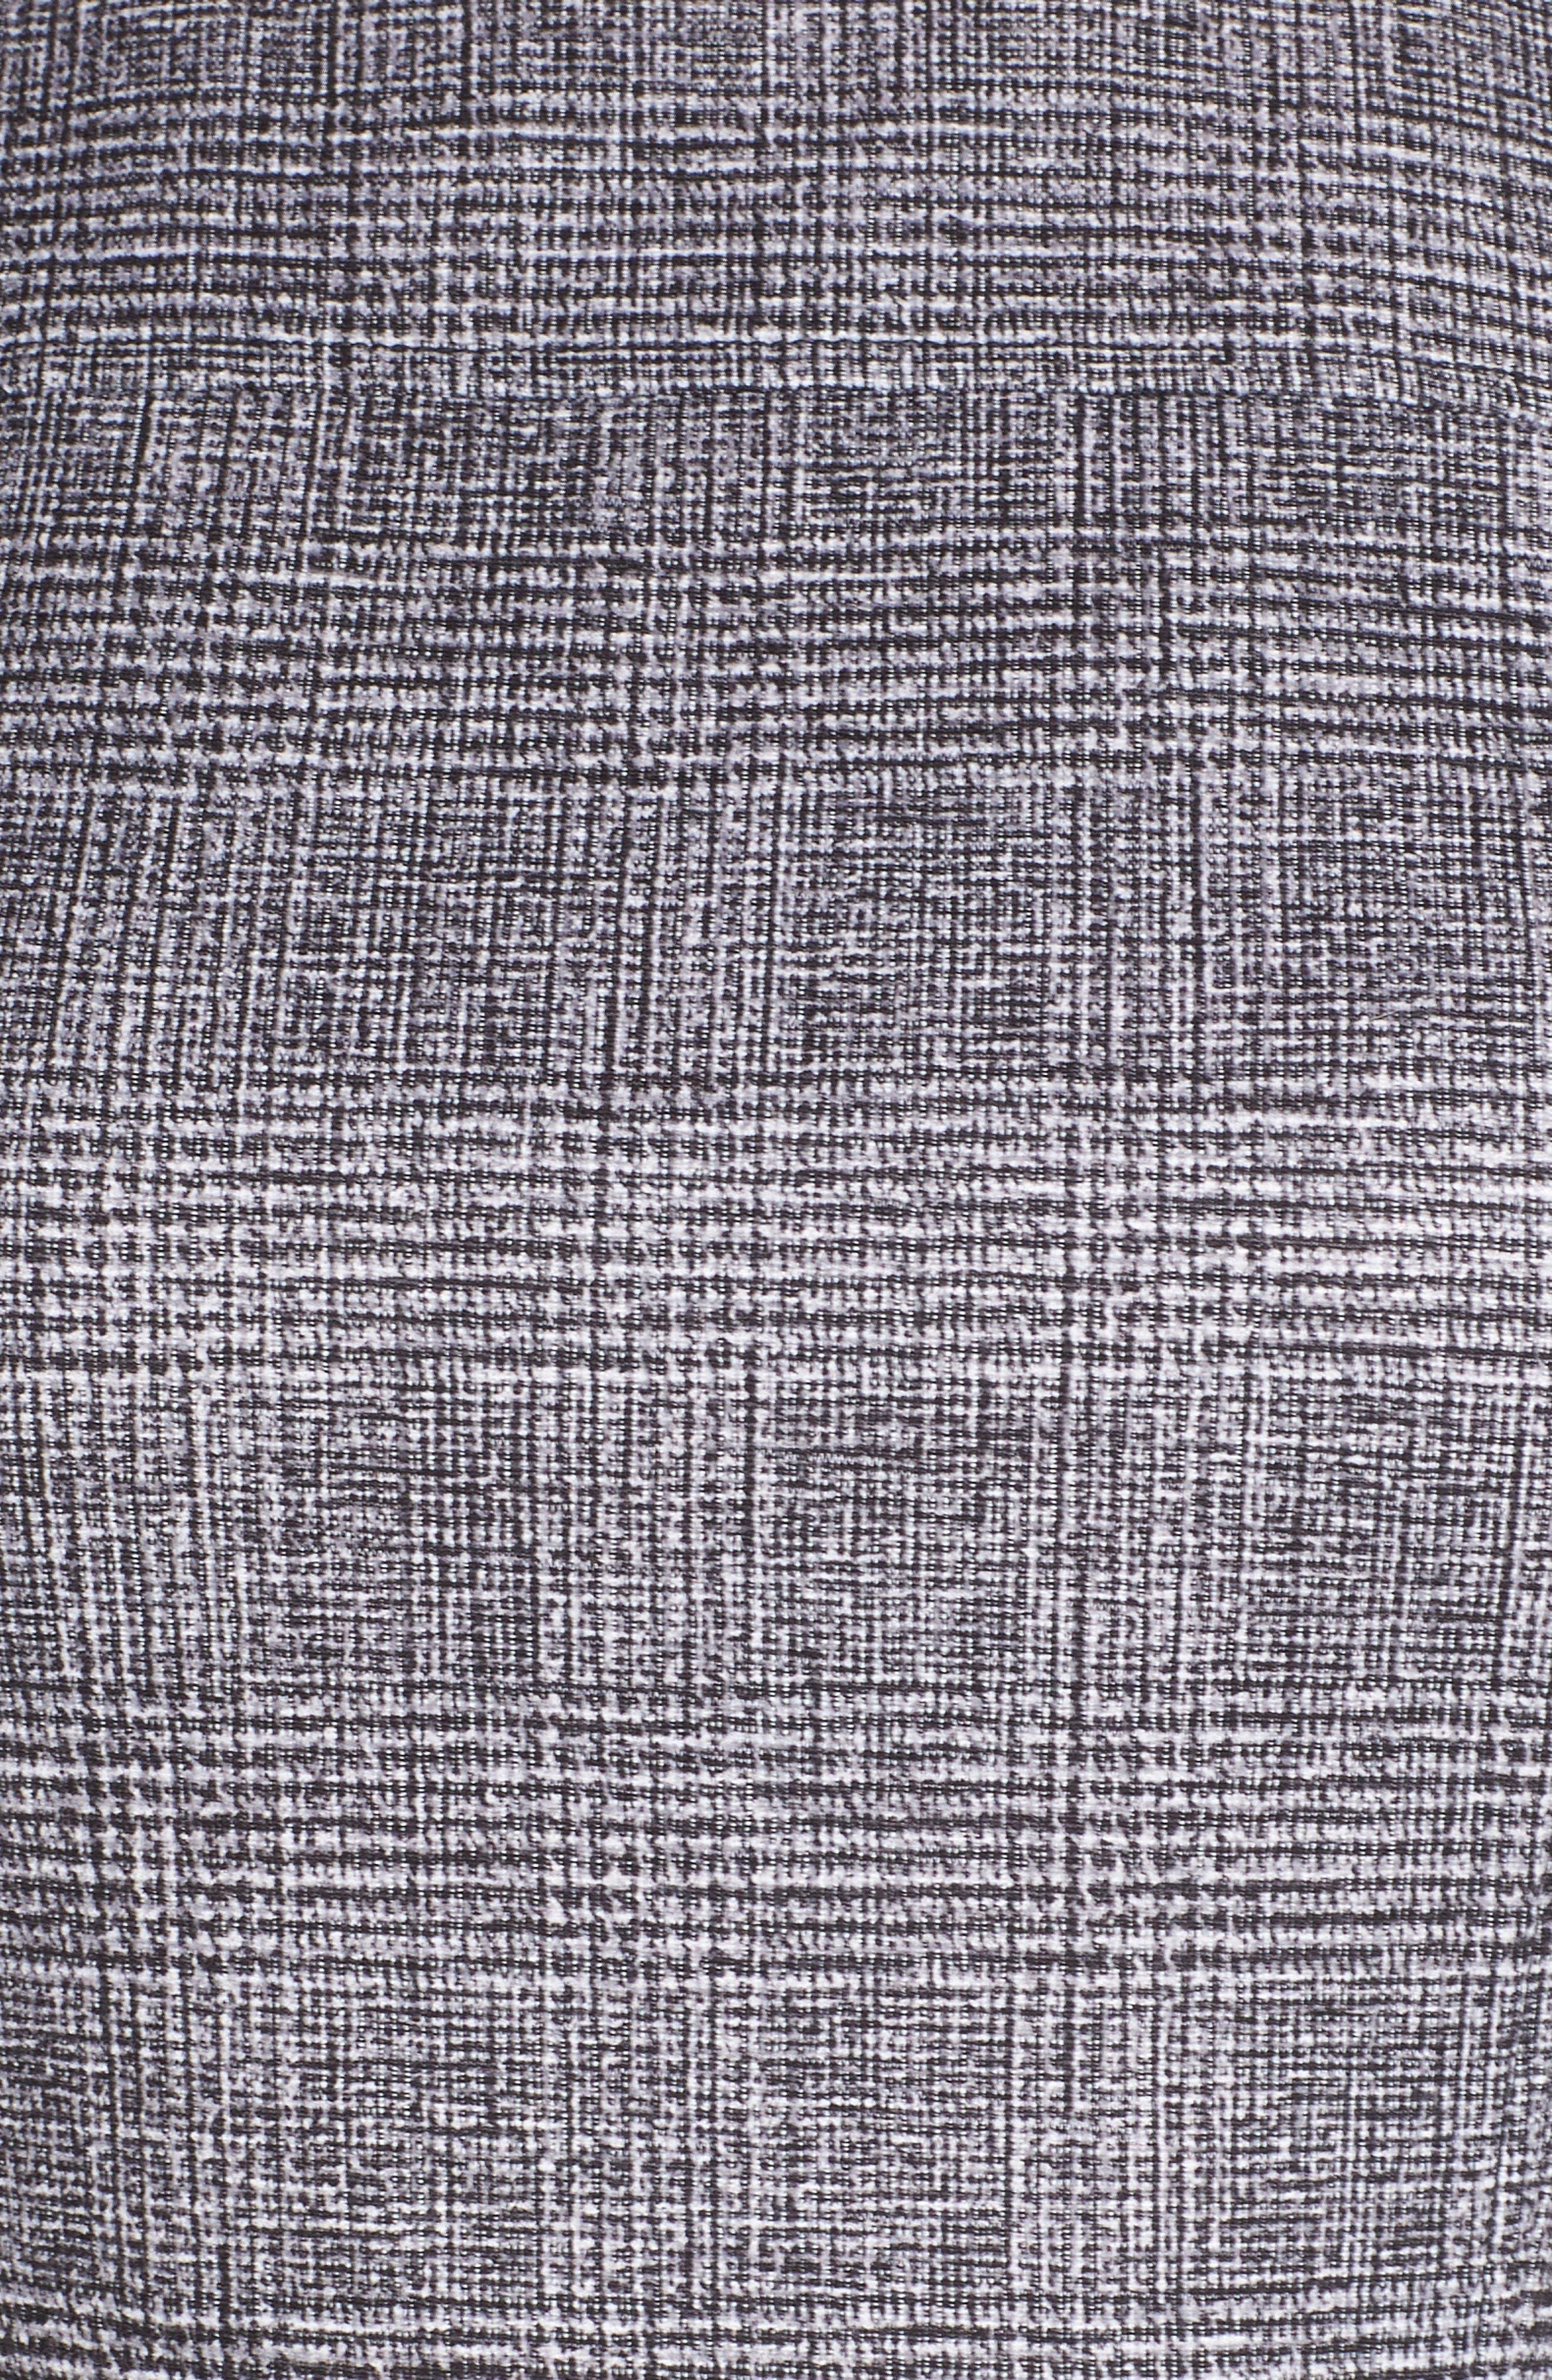 CHELSEA28,                             Sleeveless Plaid Dress,                             Alternate thumbnail 6, color,                             001